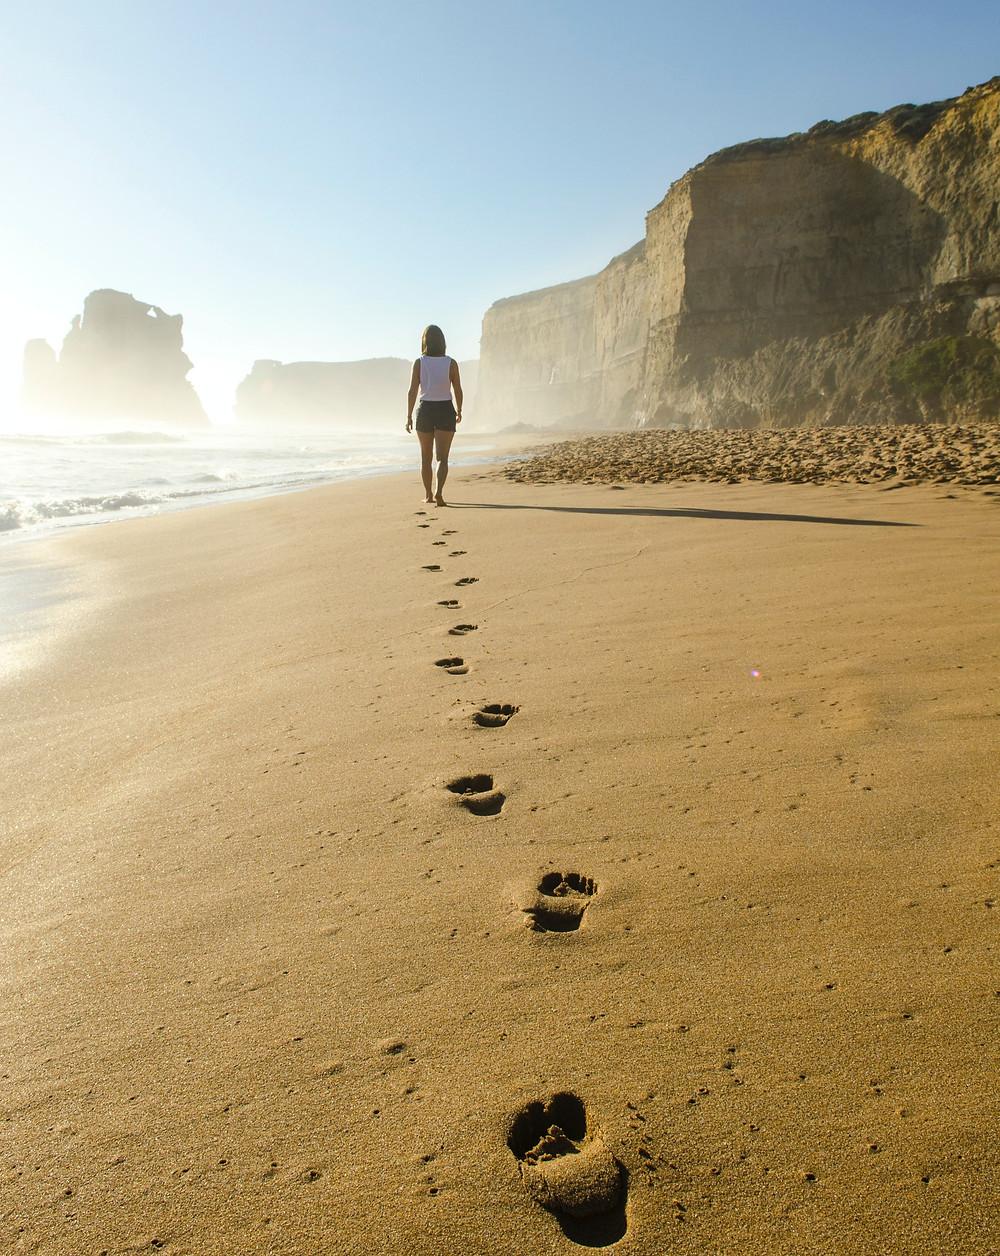 Girl walking on a beach leaving foot prints